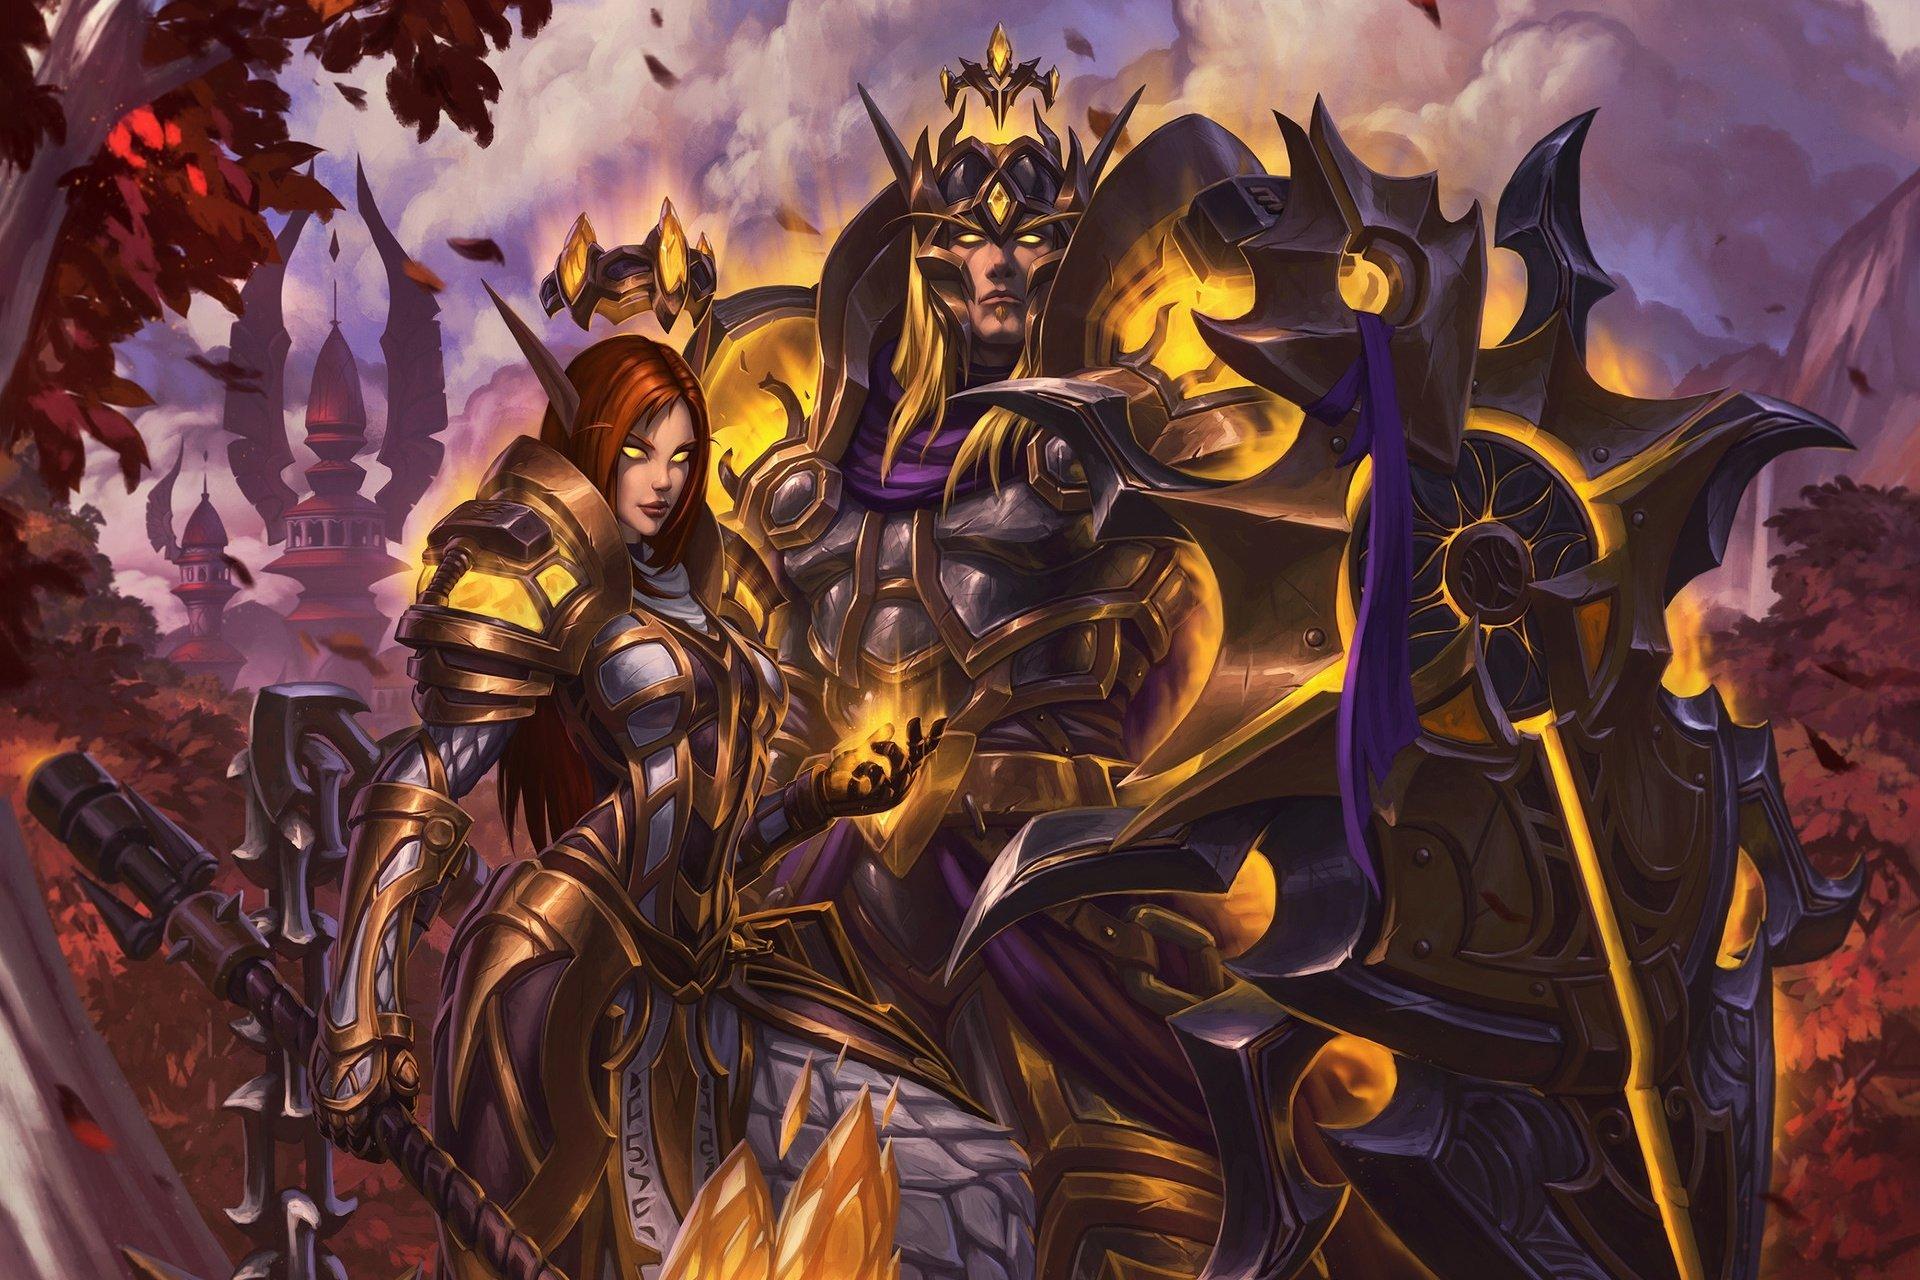 World Of Warcraft Fondo De Pantalla Hd Fondo De Escritorio